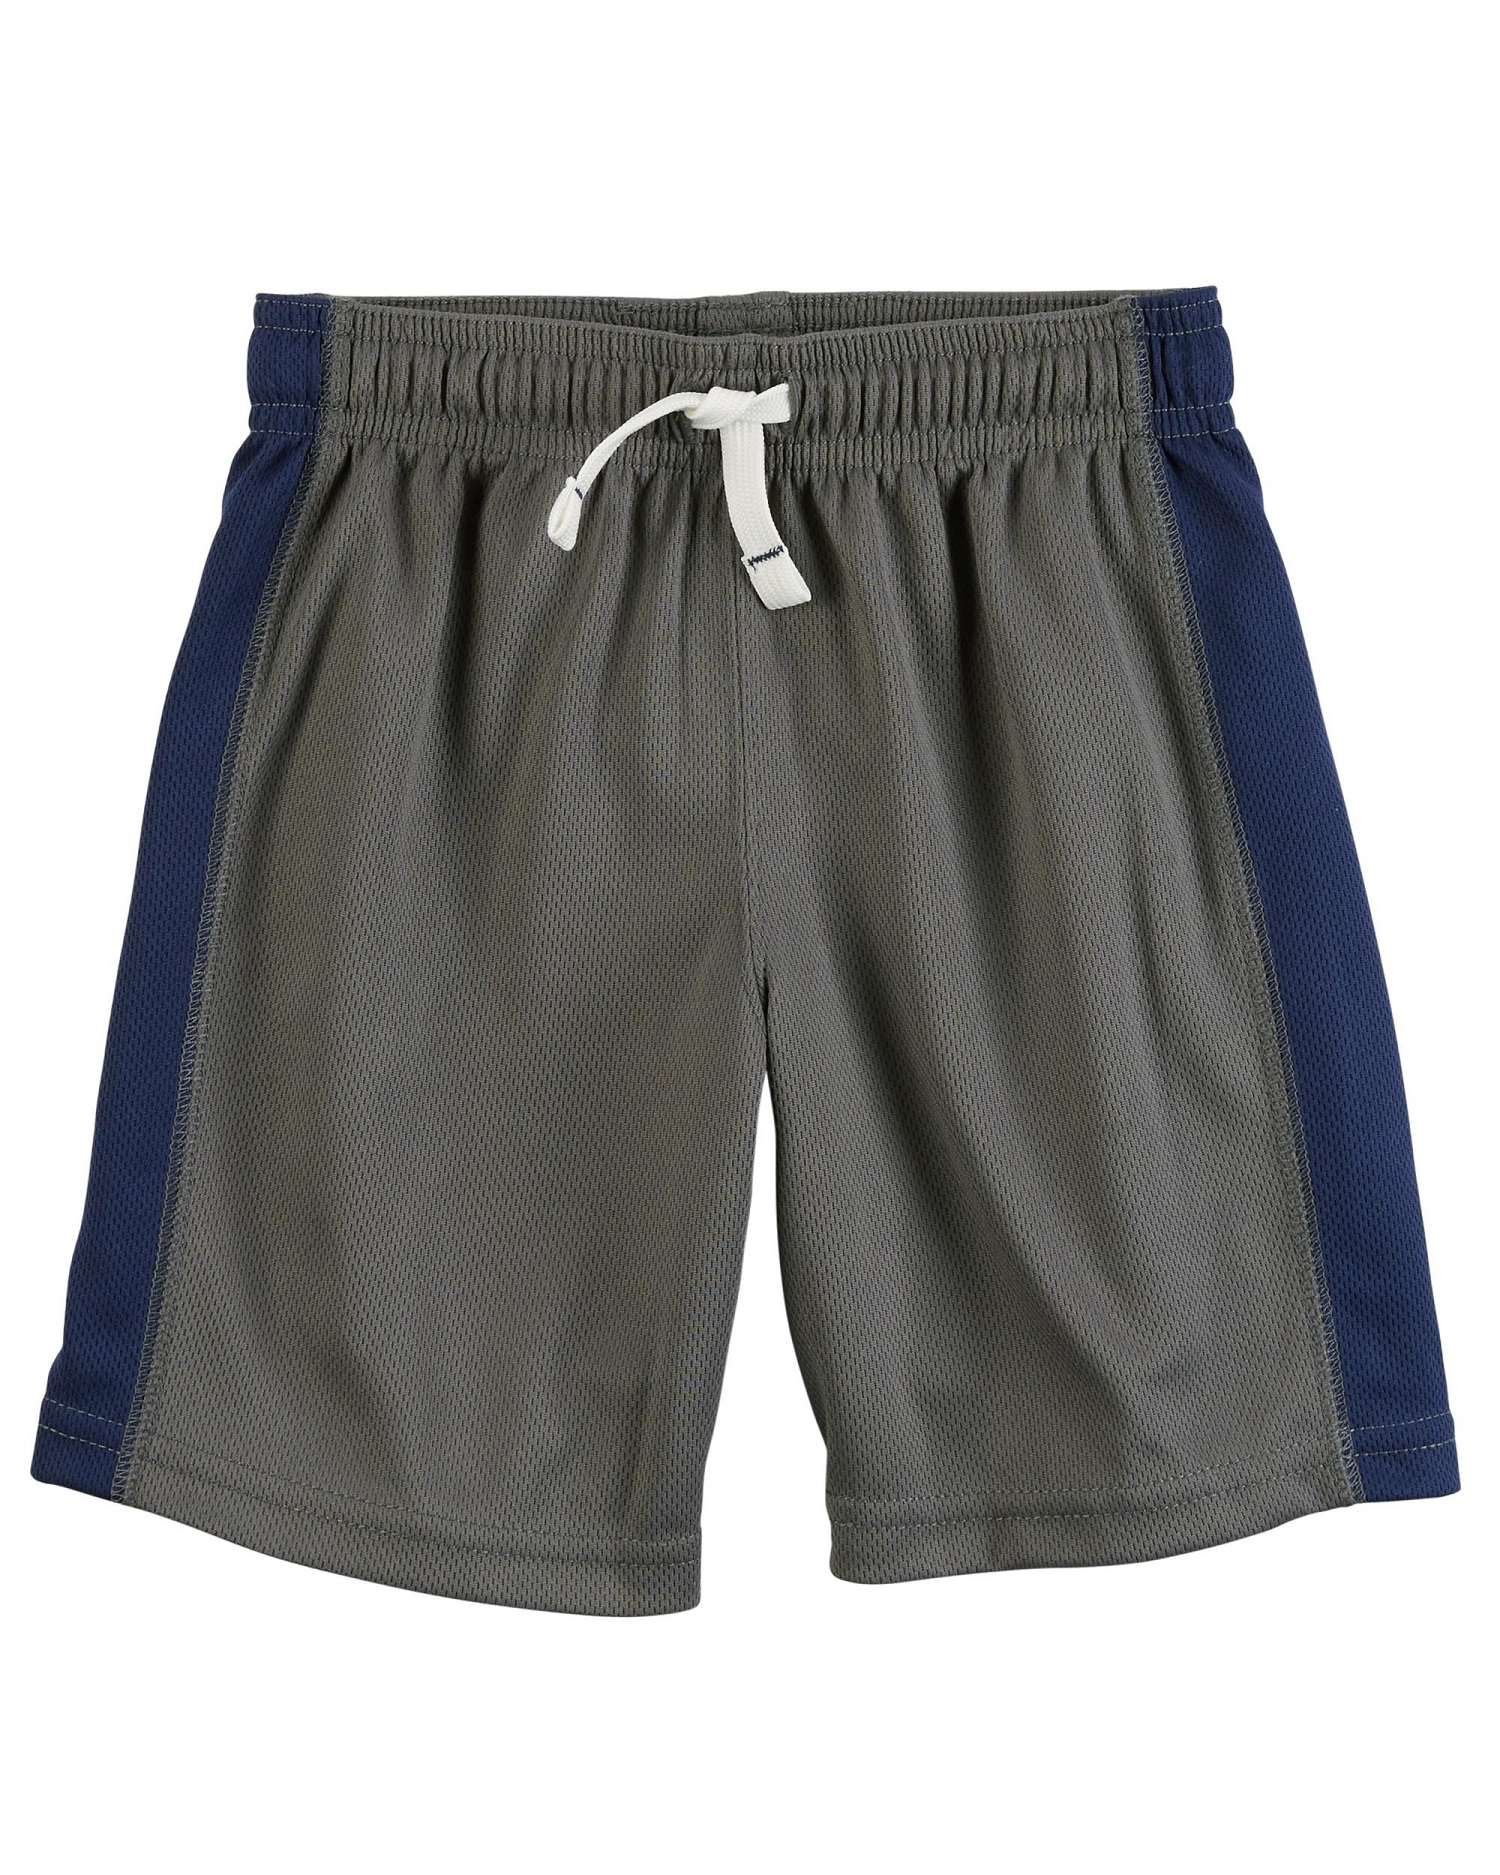 Carter's Baby Boys' Pull-On Mesh Shorts